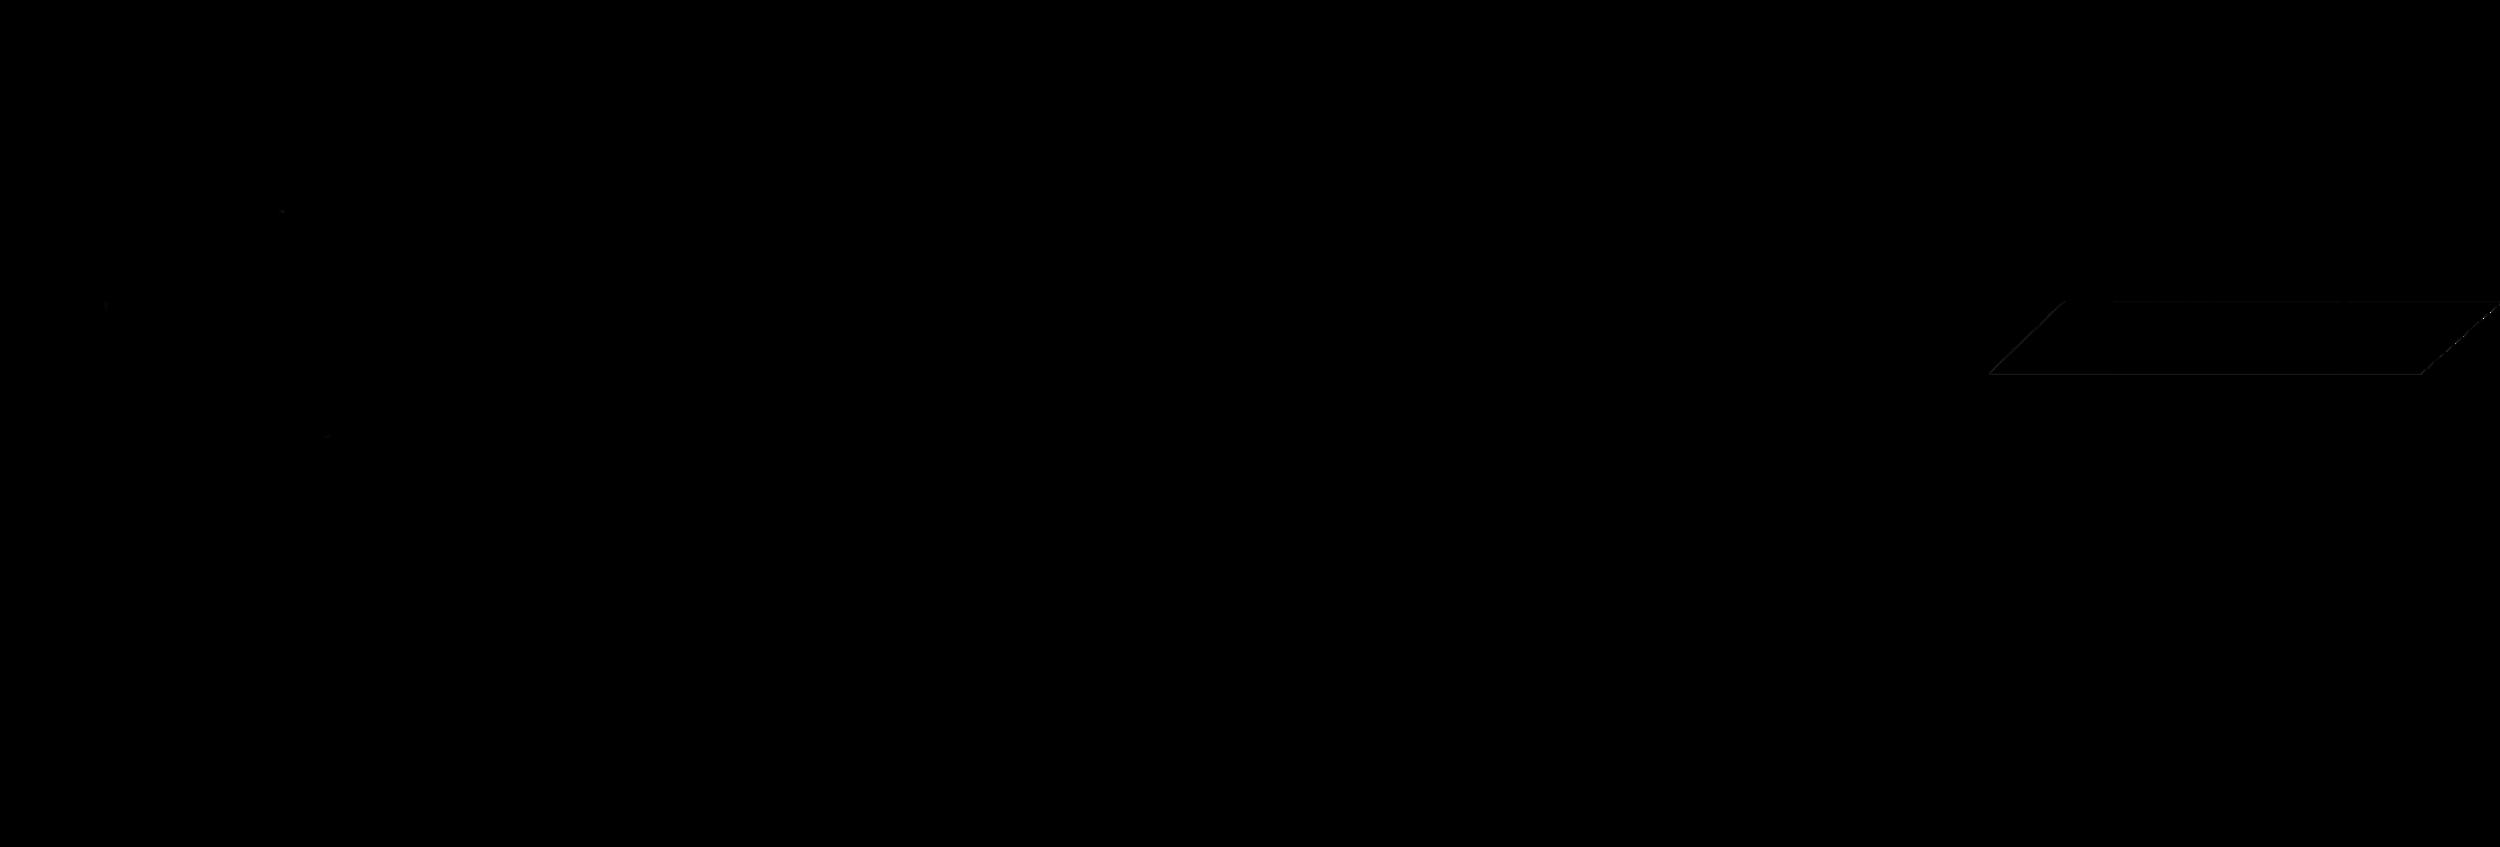 Odrive logo plus text black.png